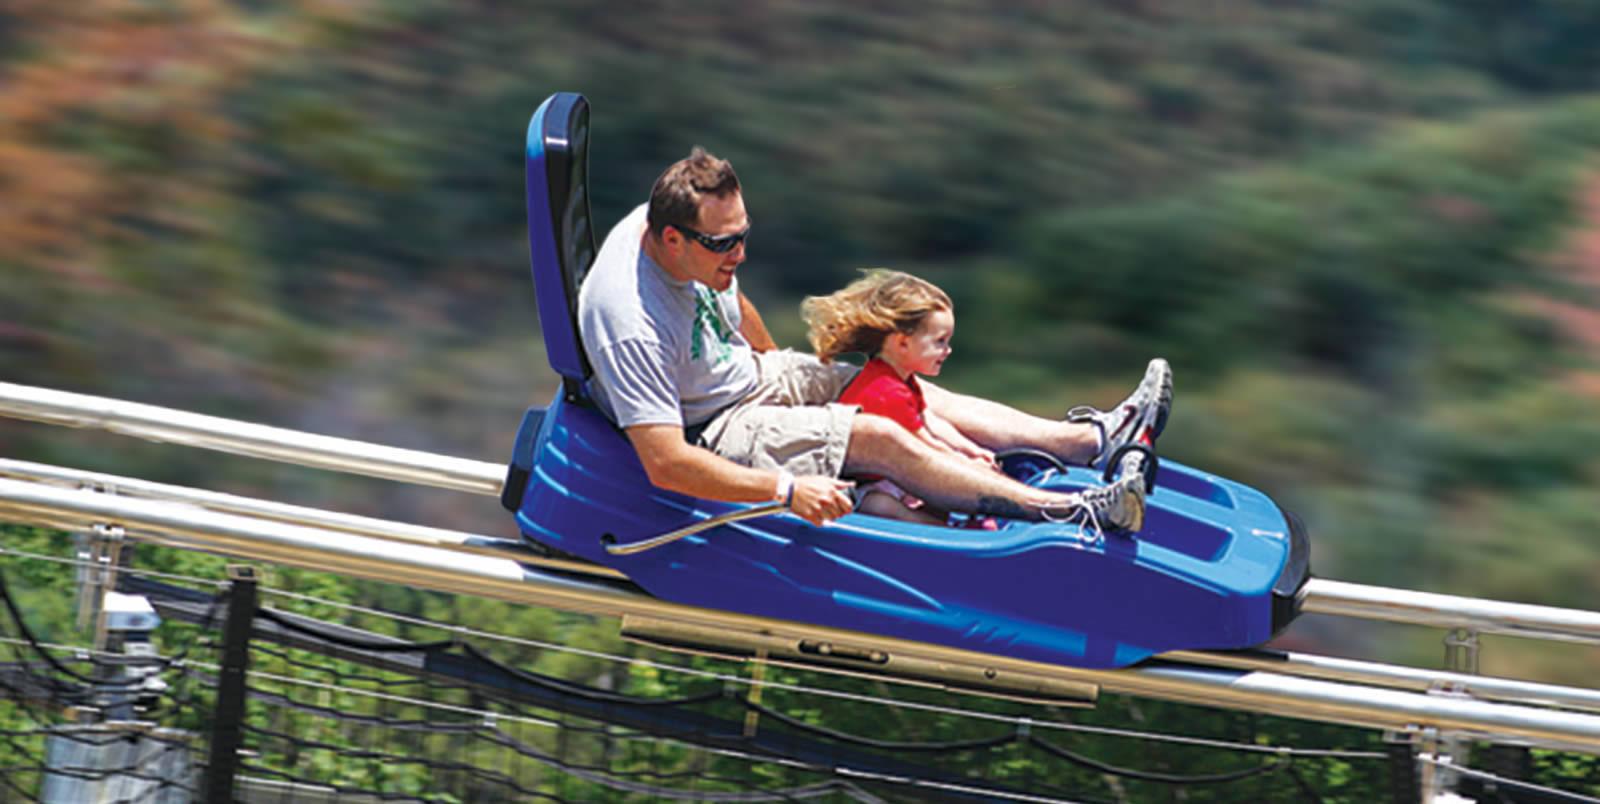 alpine mountain coaster videos amp facts coasterforce